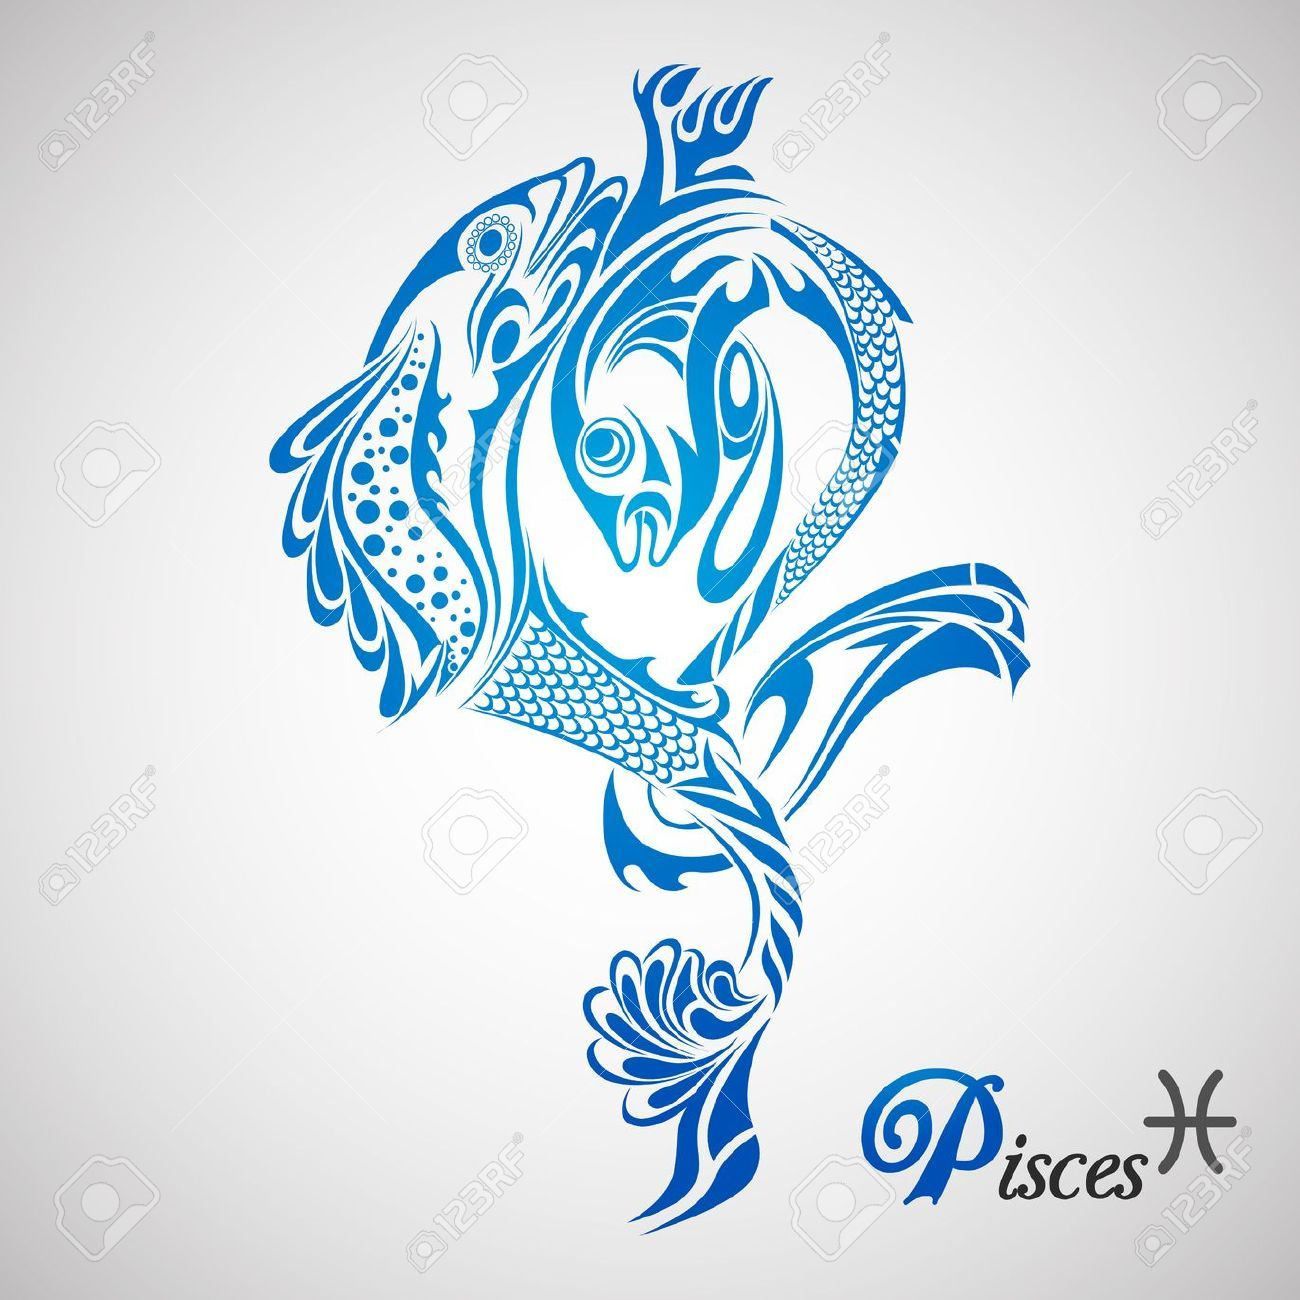 List Of Pinterest Pisces Zodiac Tattoo Design Signs Images Pisces